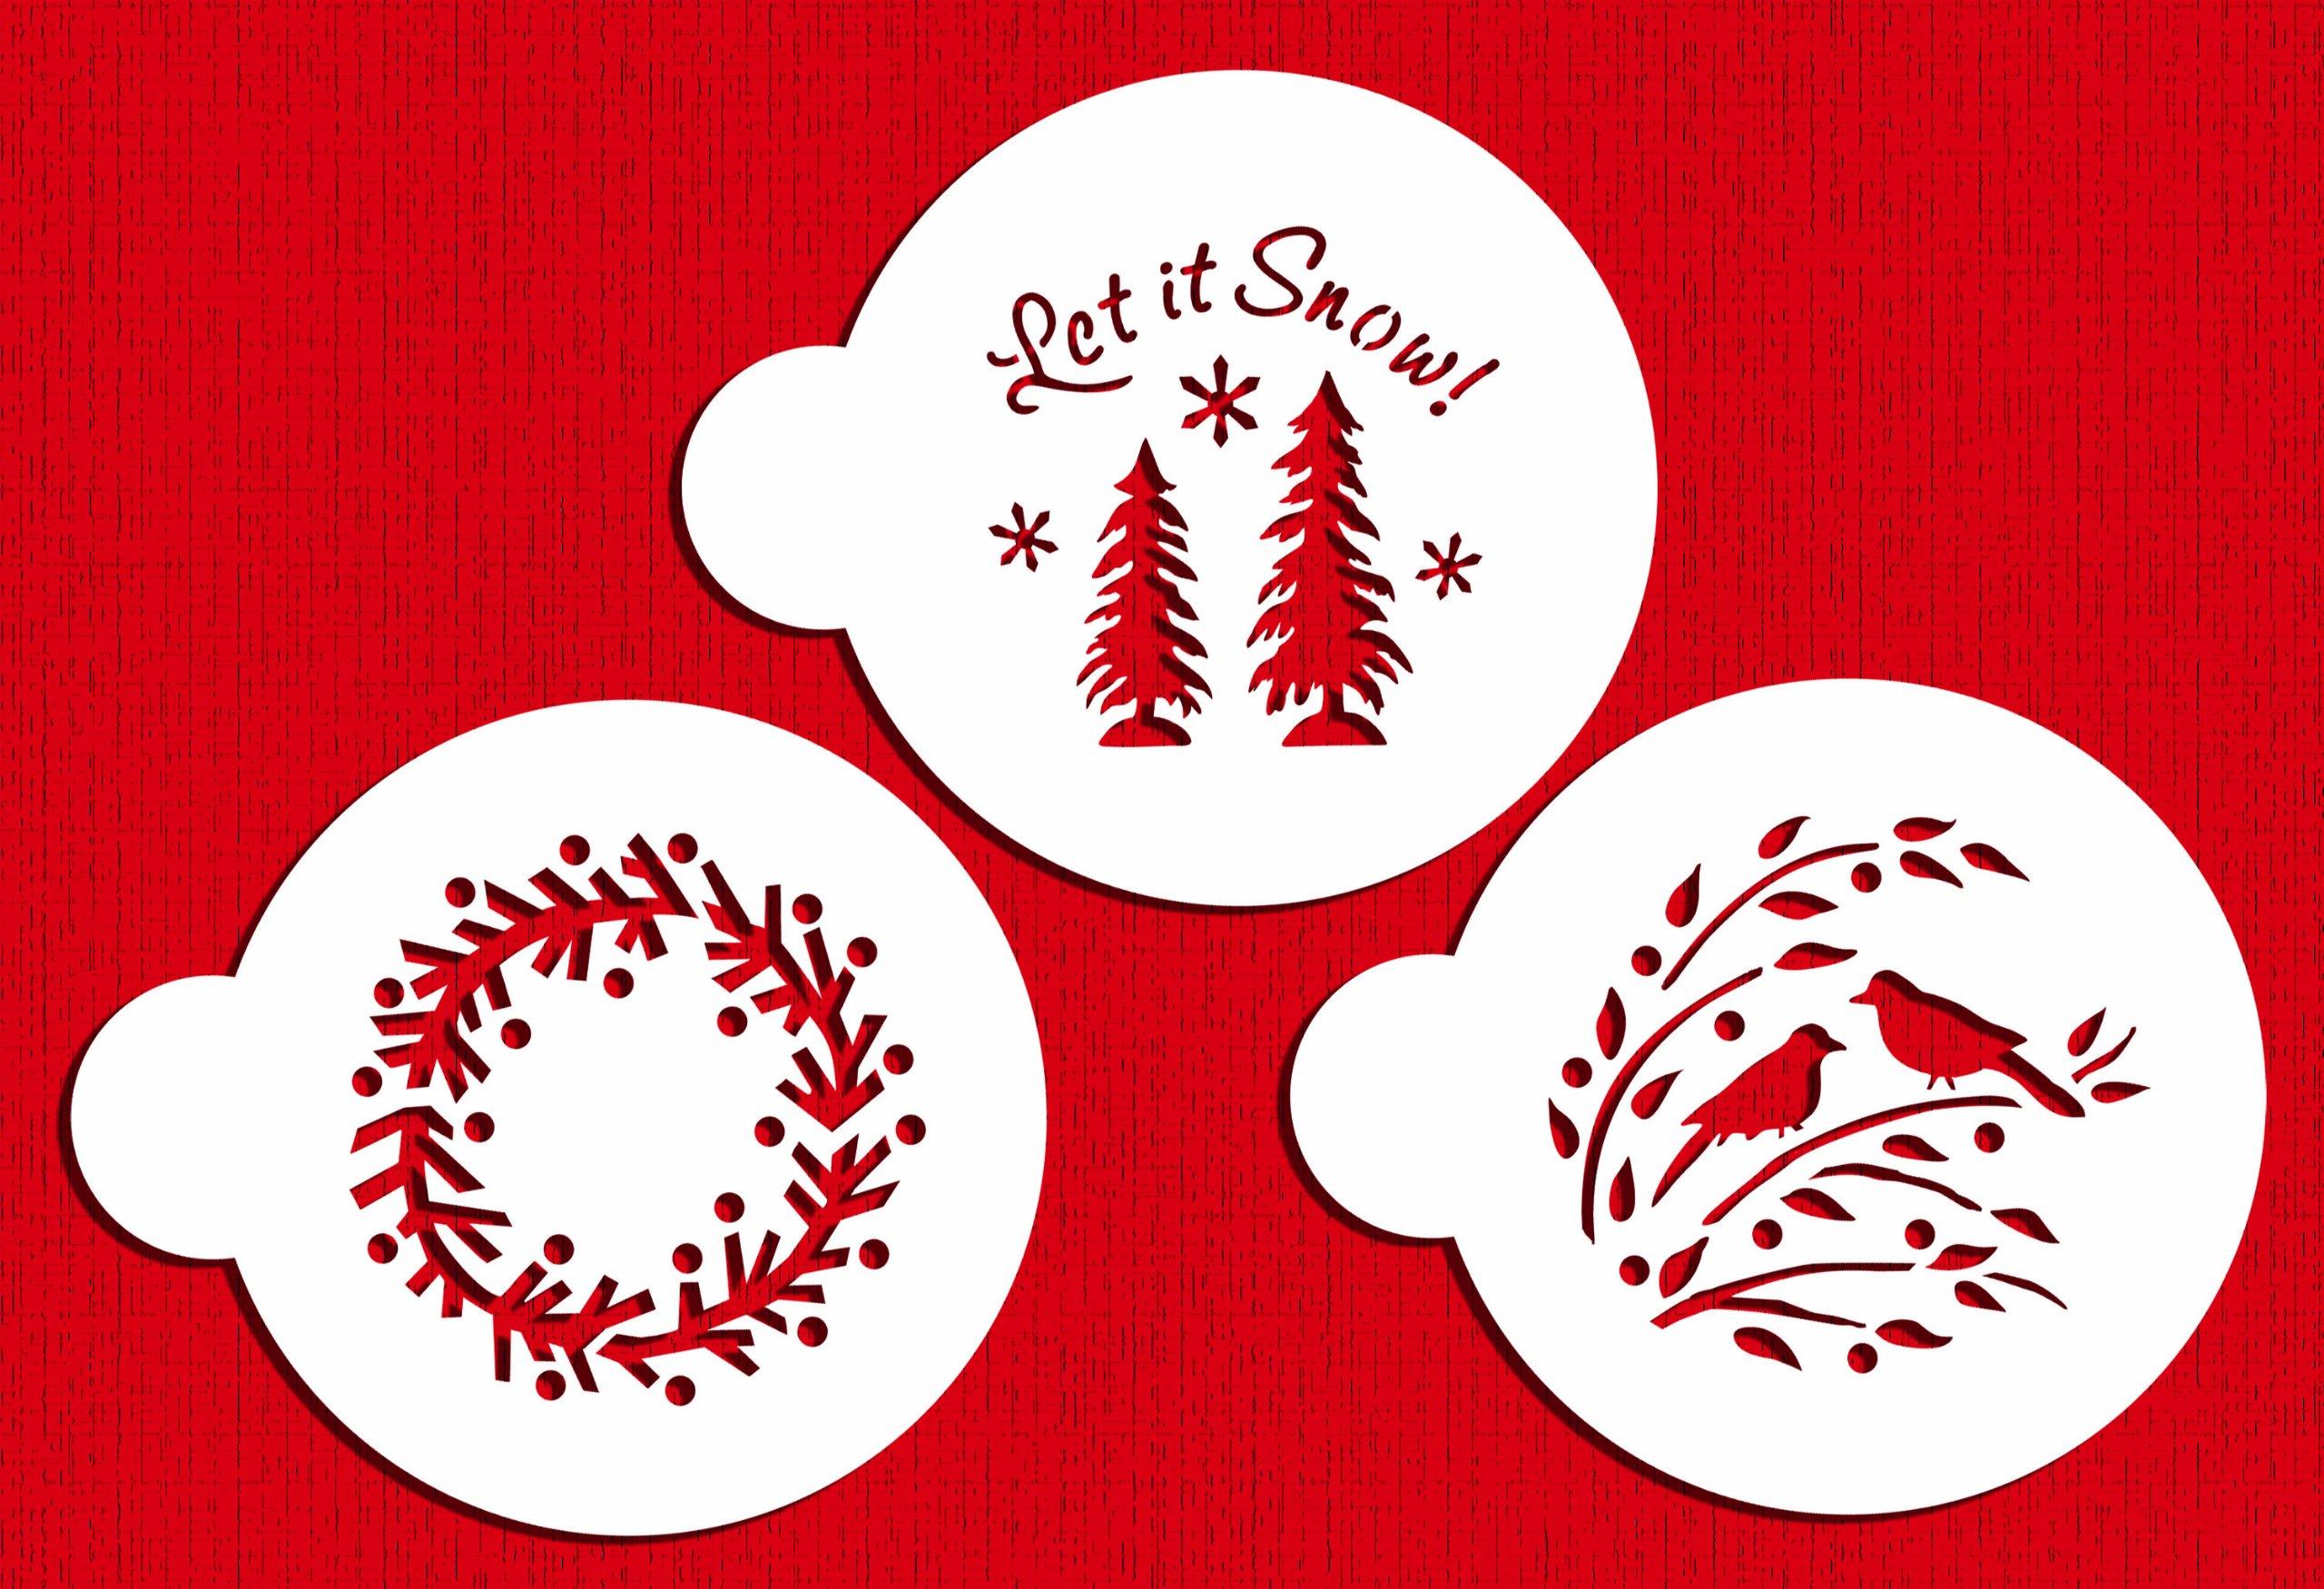 Designer Stencils C750 Let it Snow Cookie Stencils, (Wreath, Trees and Winter Lovebirds) Beige/semi-transparent